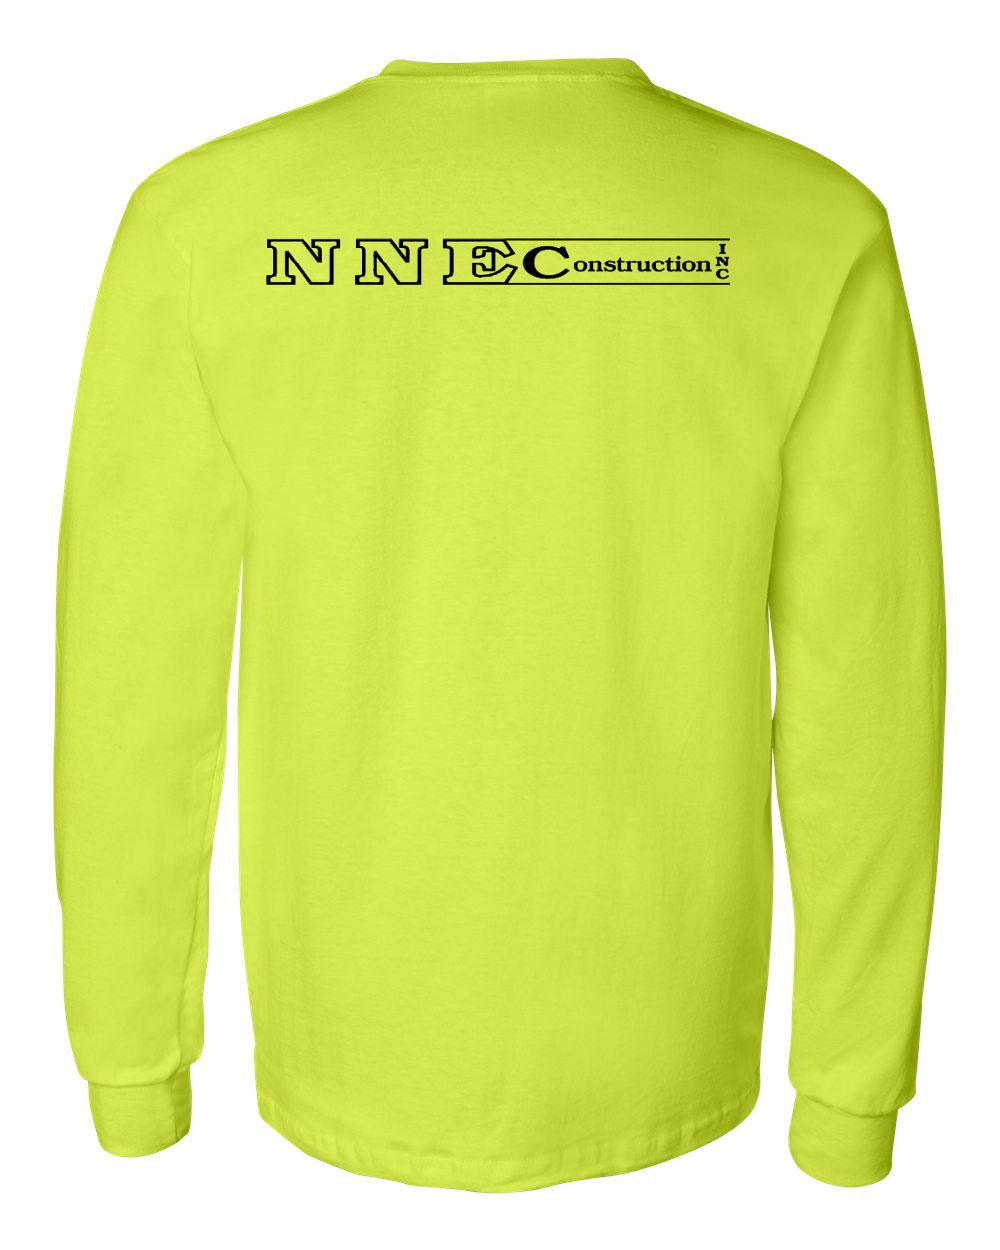 Gildan 2410 Ultra Cotton Long Sleeve T-Shirt with a Pocket